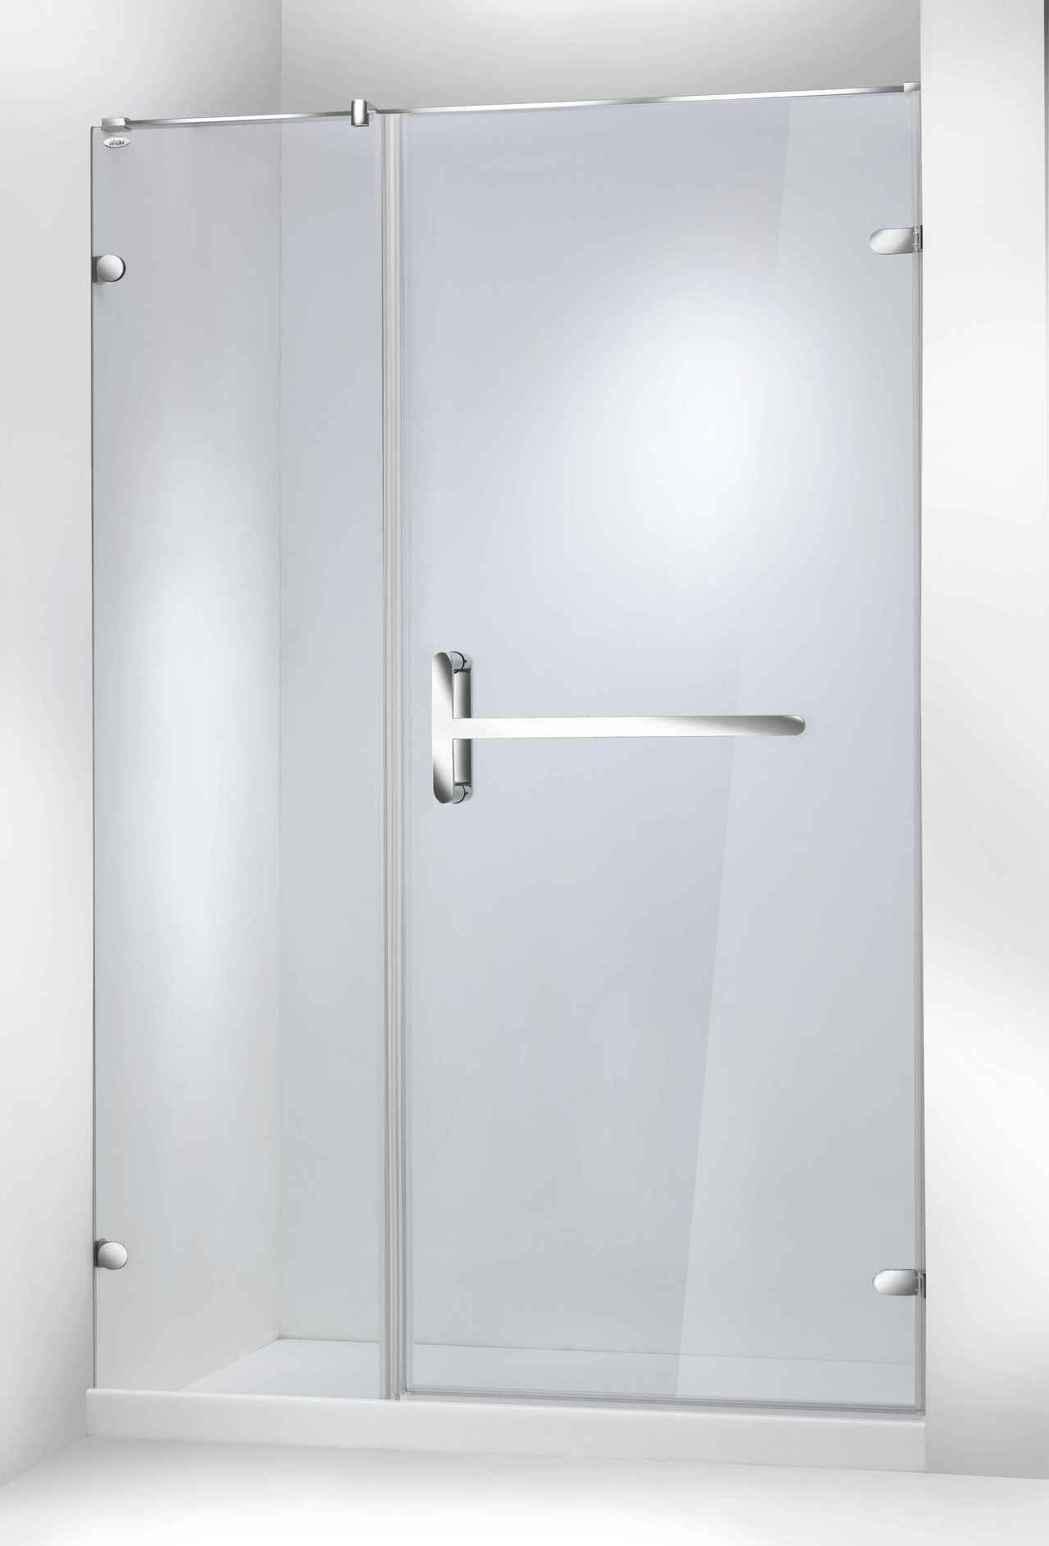 ITAI2019新款內外推拉式淋浴拉門。 一太e衛浴/提供